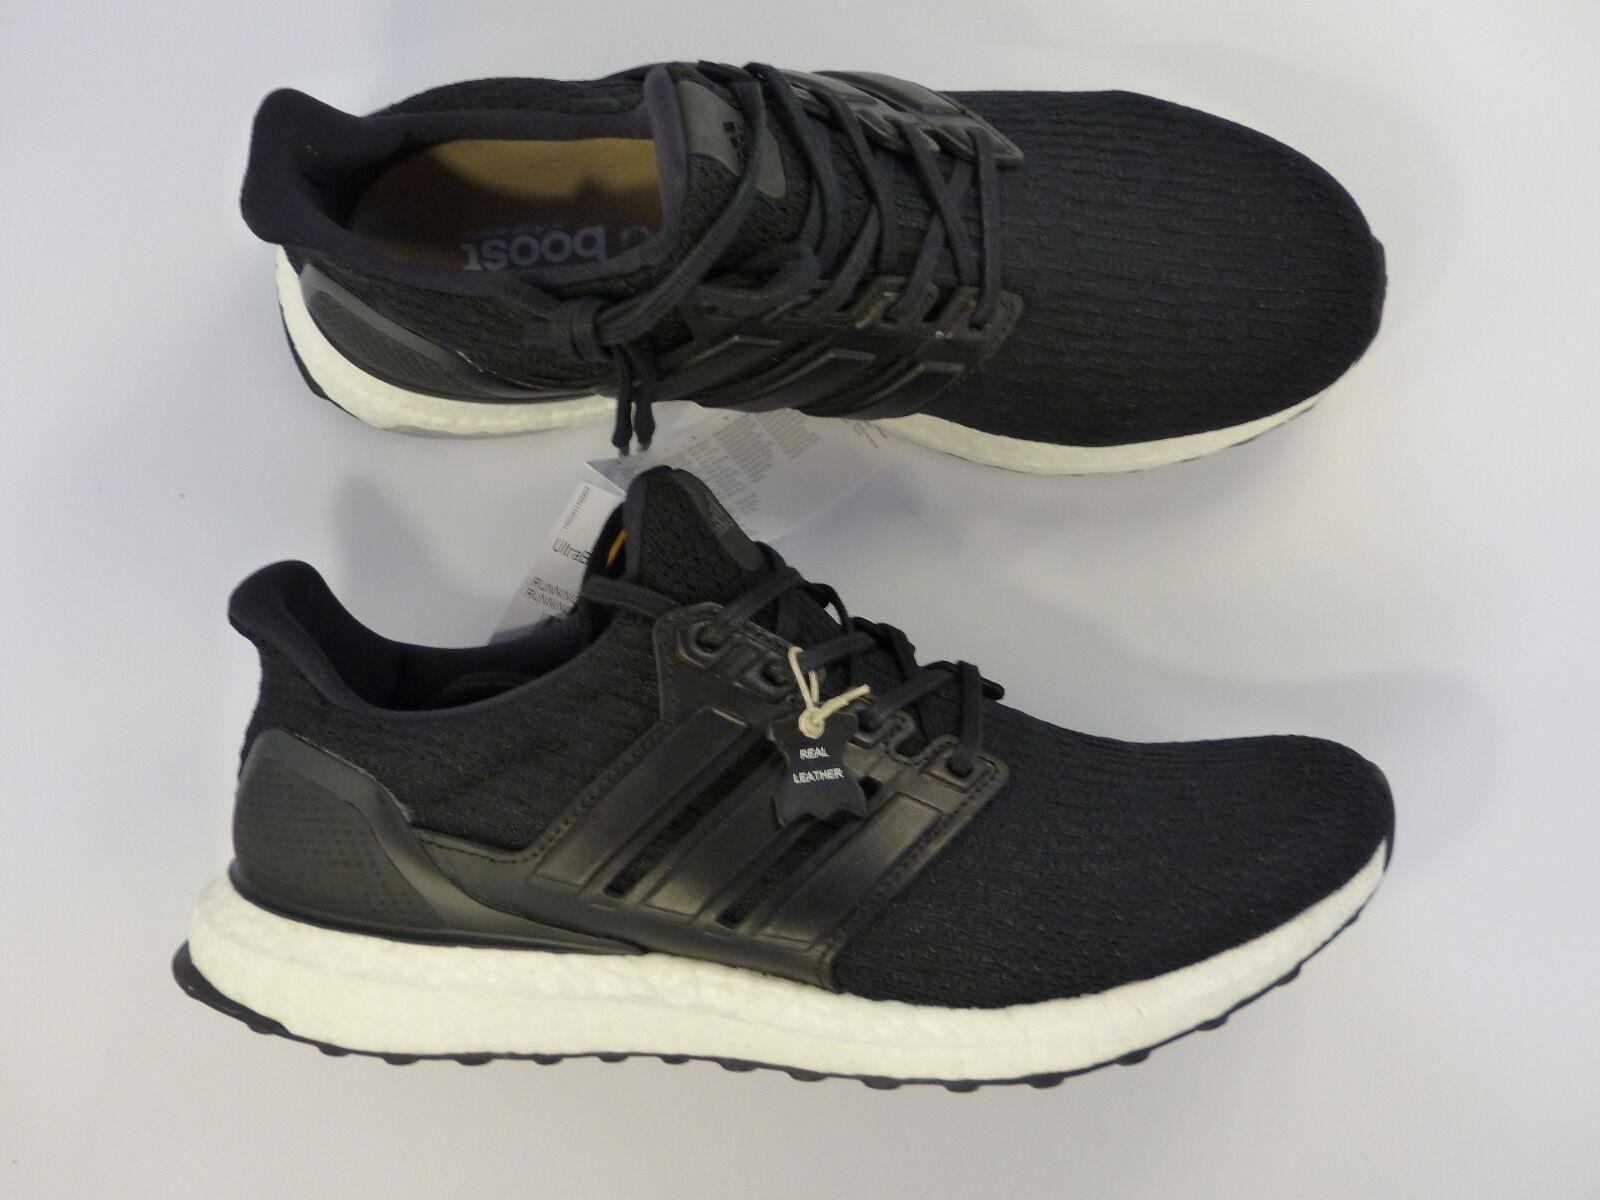 Adidas Ultra Boost Ltd Cuir CORE Cuir Ltd Noir Cage UK9 EU43 1 3 DS BA8924 ddd7a5